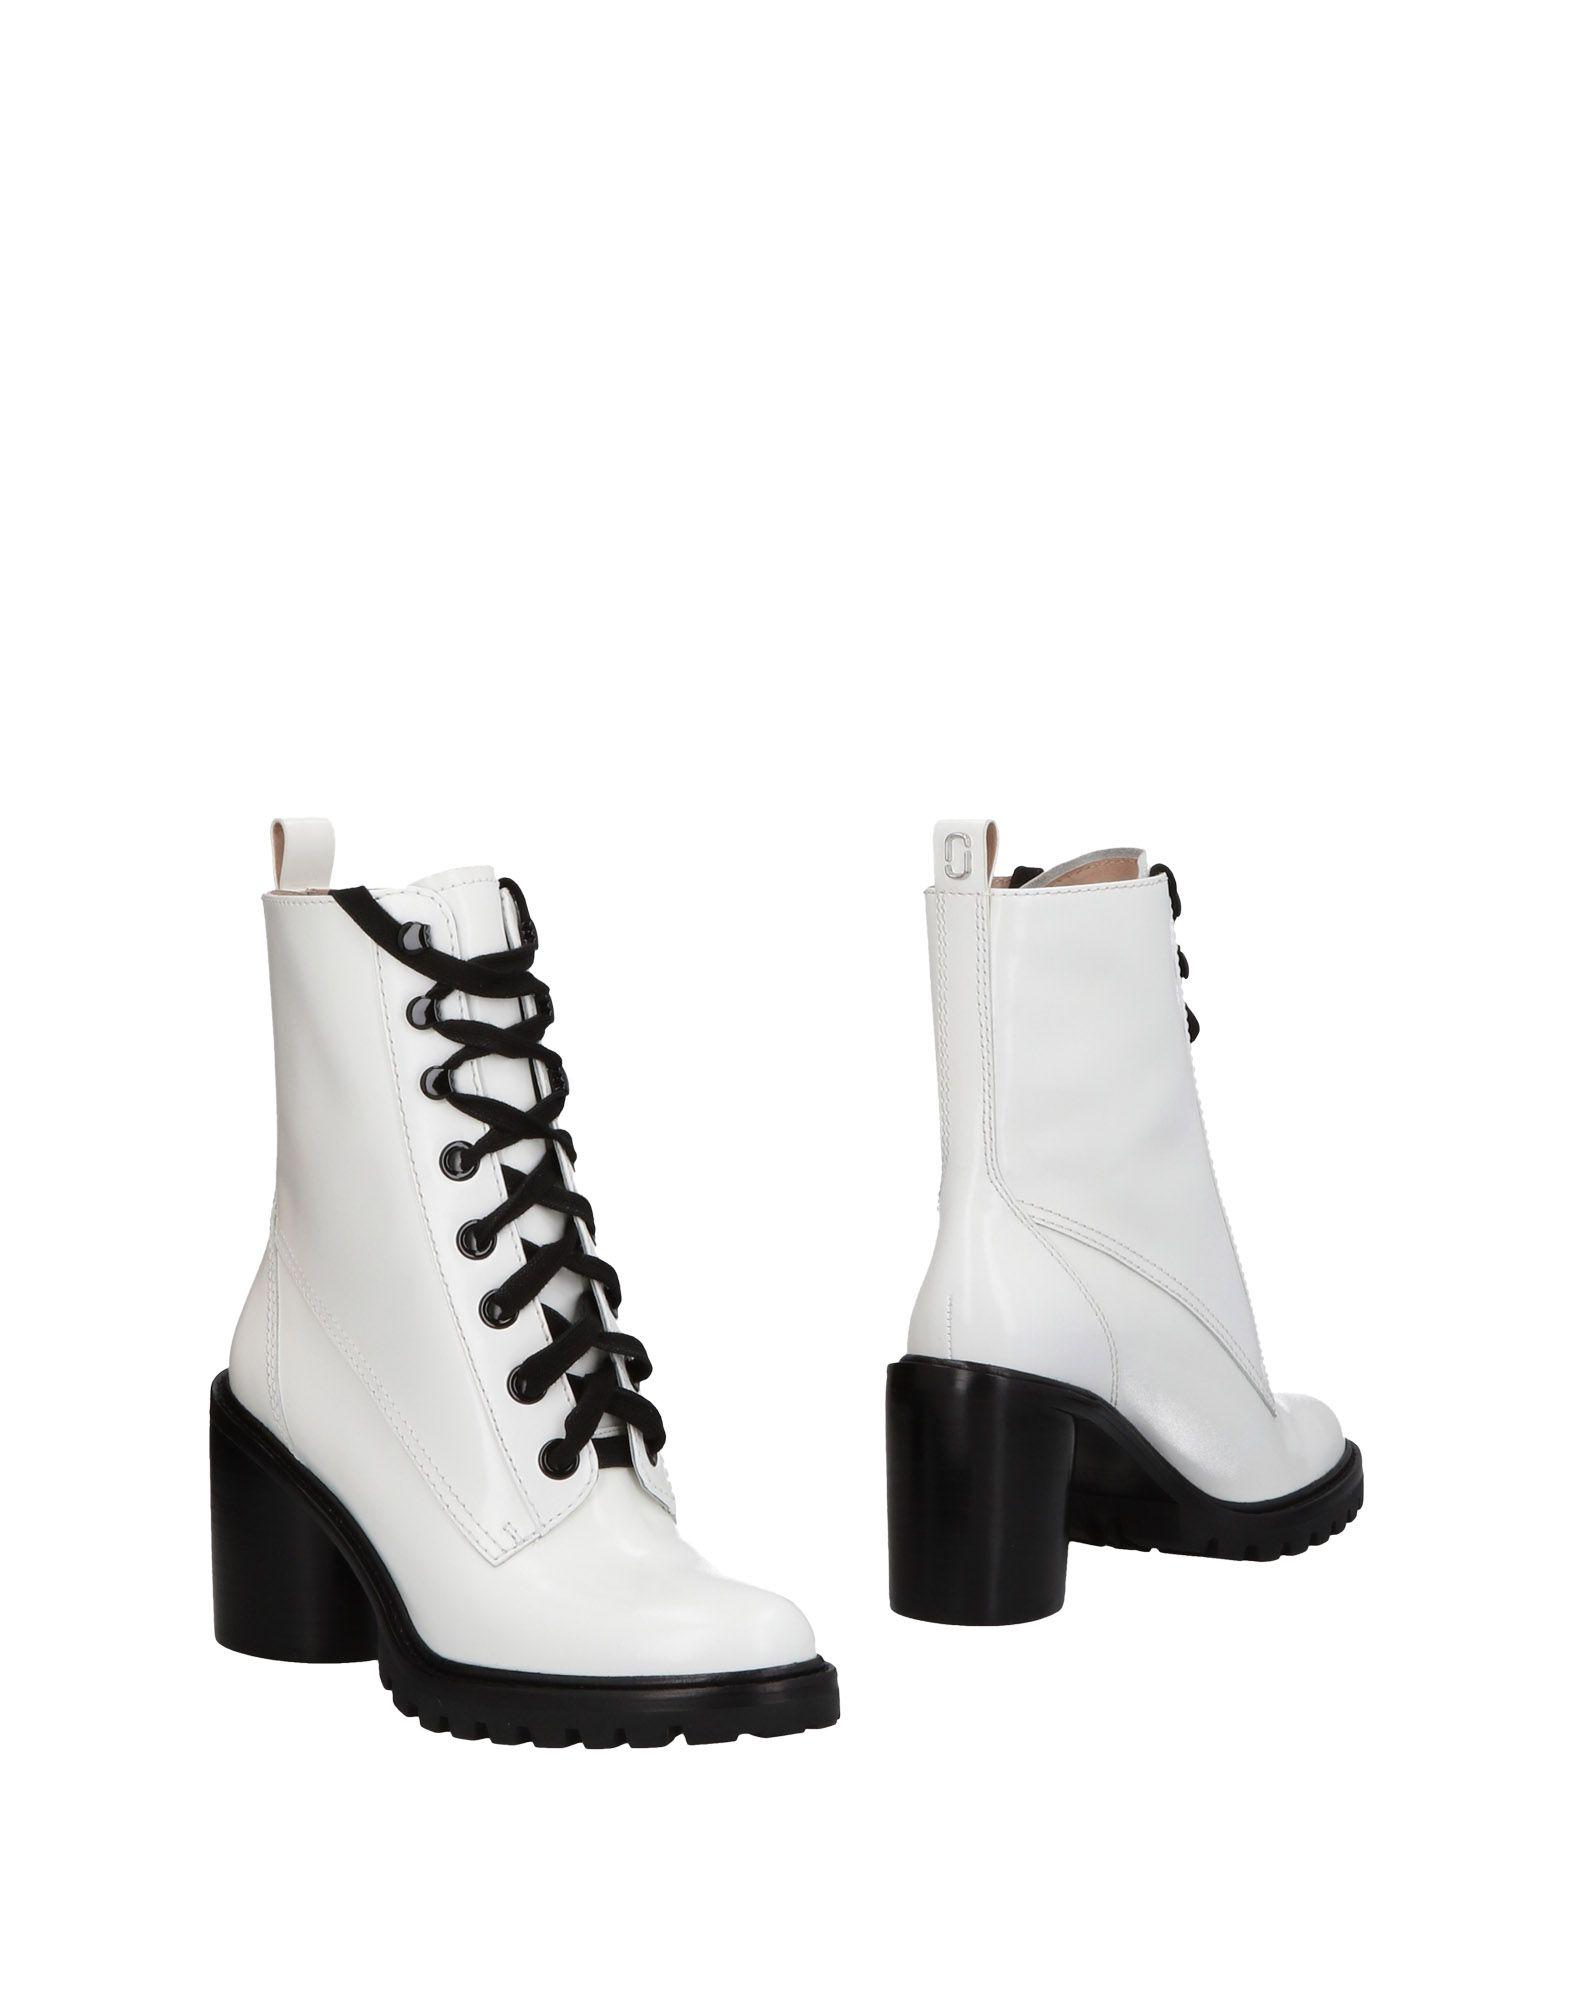 Rabatt Schuhe Marc Jacobs Stiefelette Damen  11465581HB